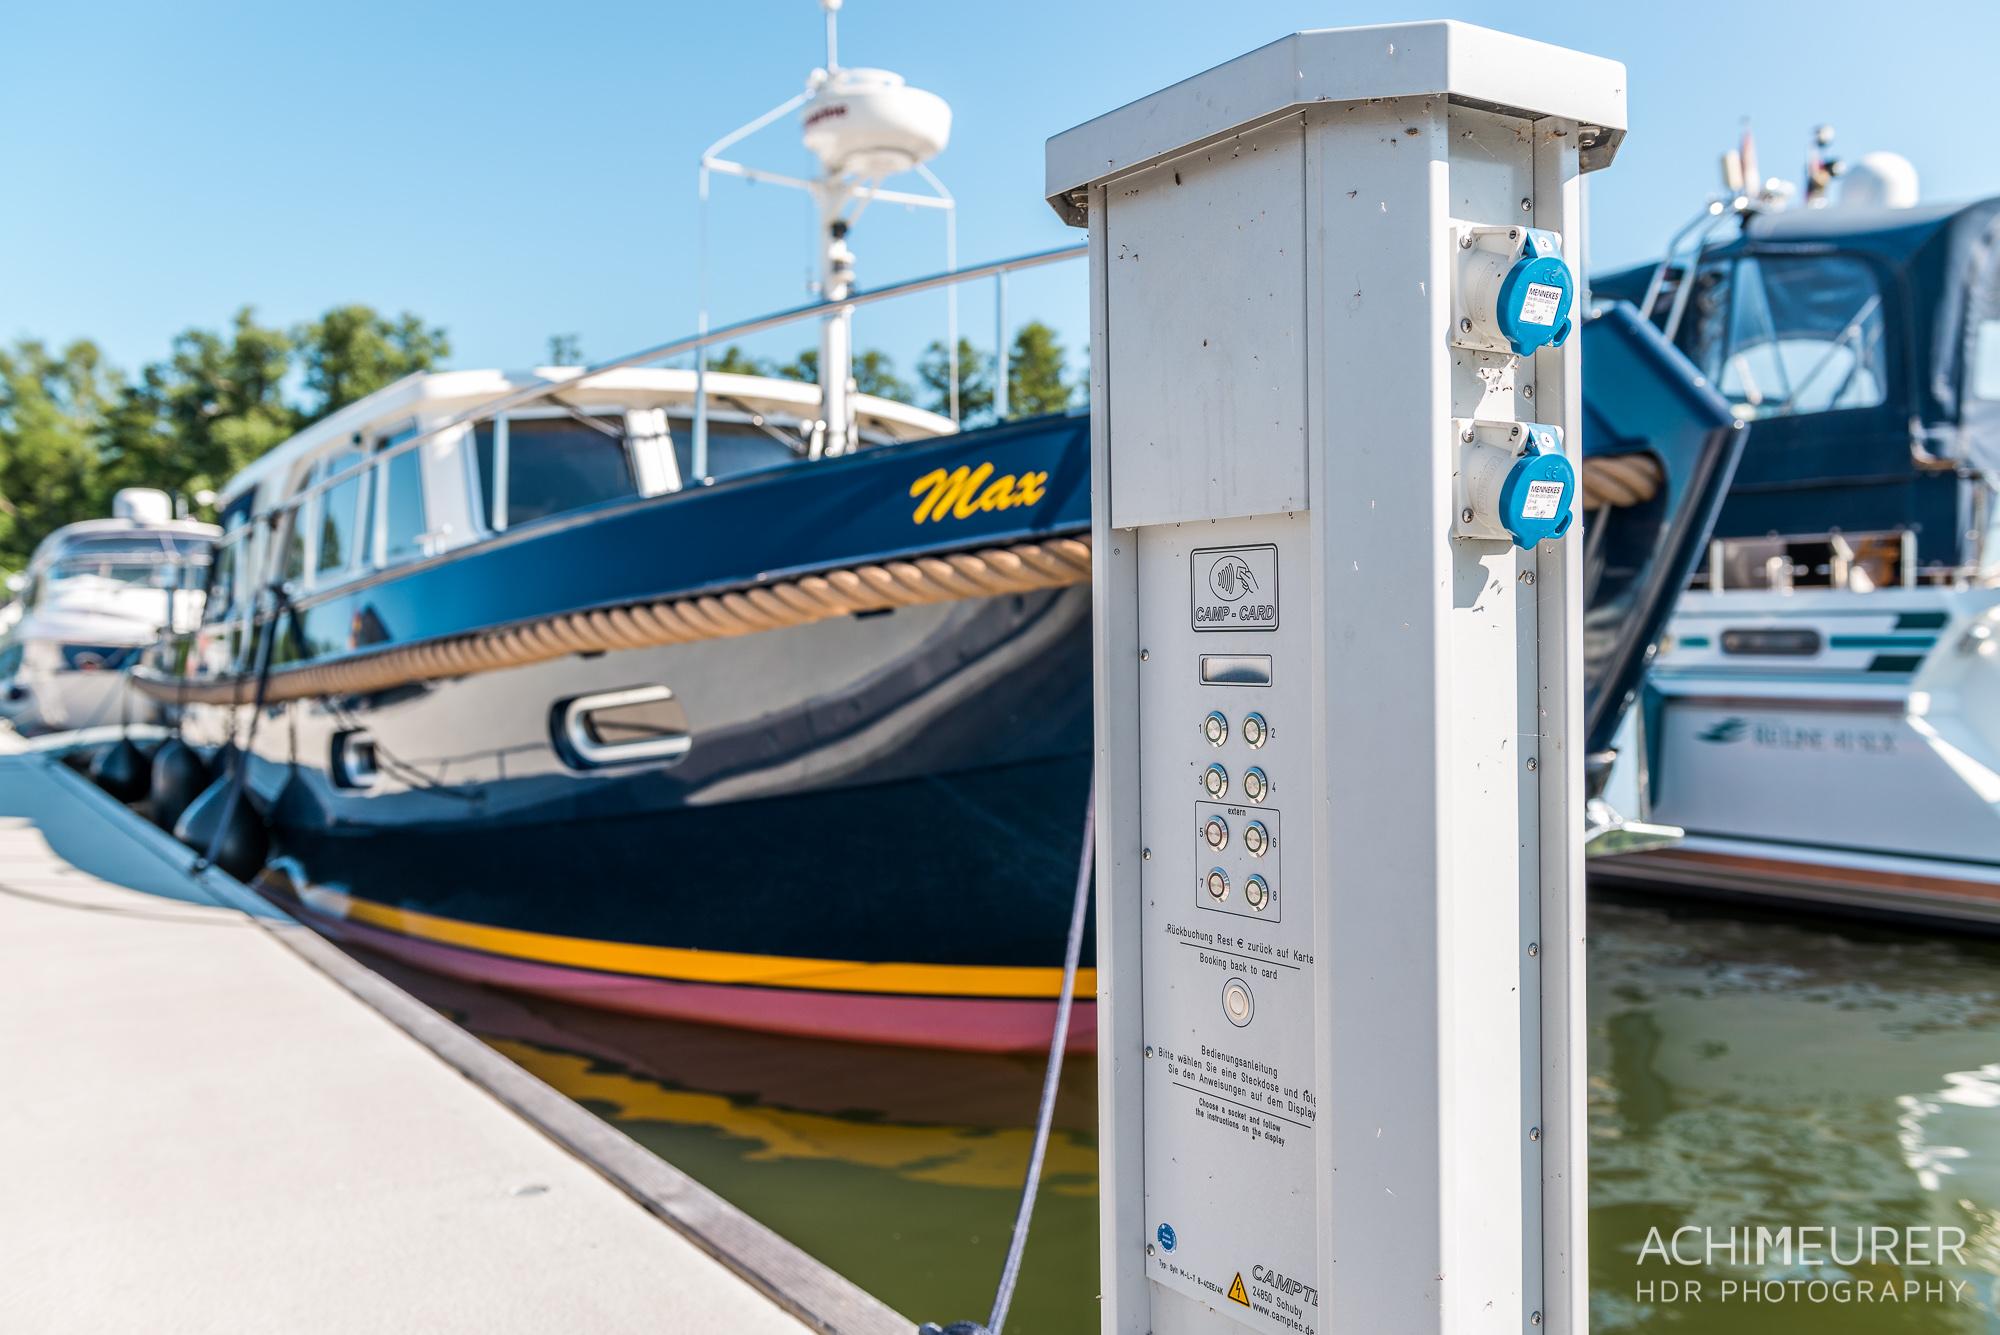 Hausboot-Kuhnle-Mueritz-Mecklenburg-Vorpommern-See_3126